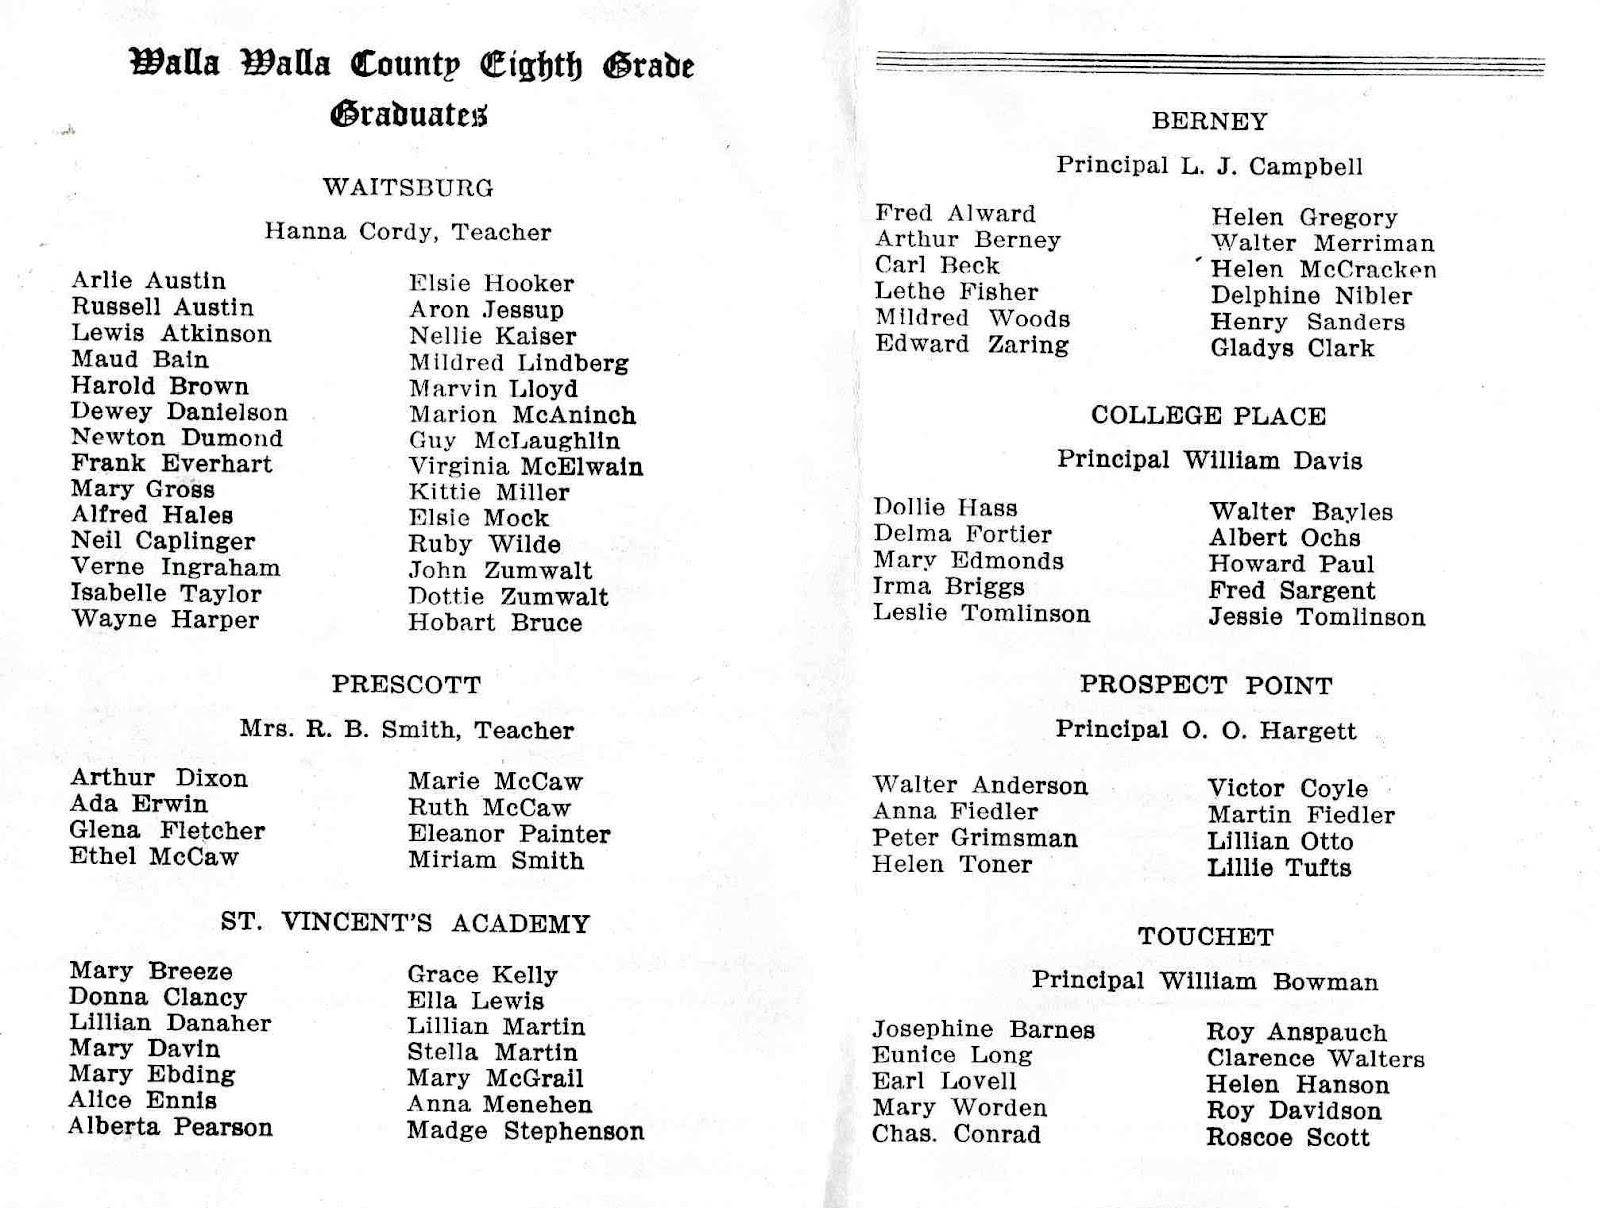 County Schools 8th Grade Graduation Program 1912